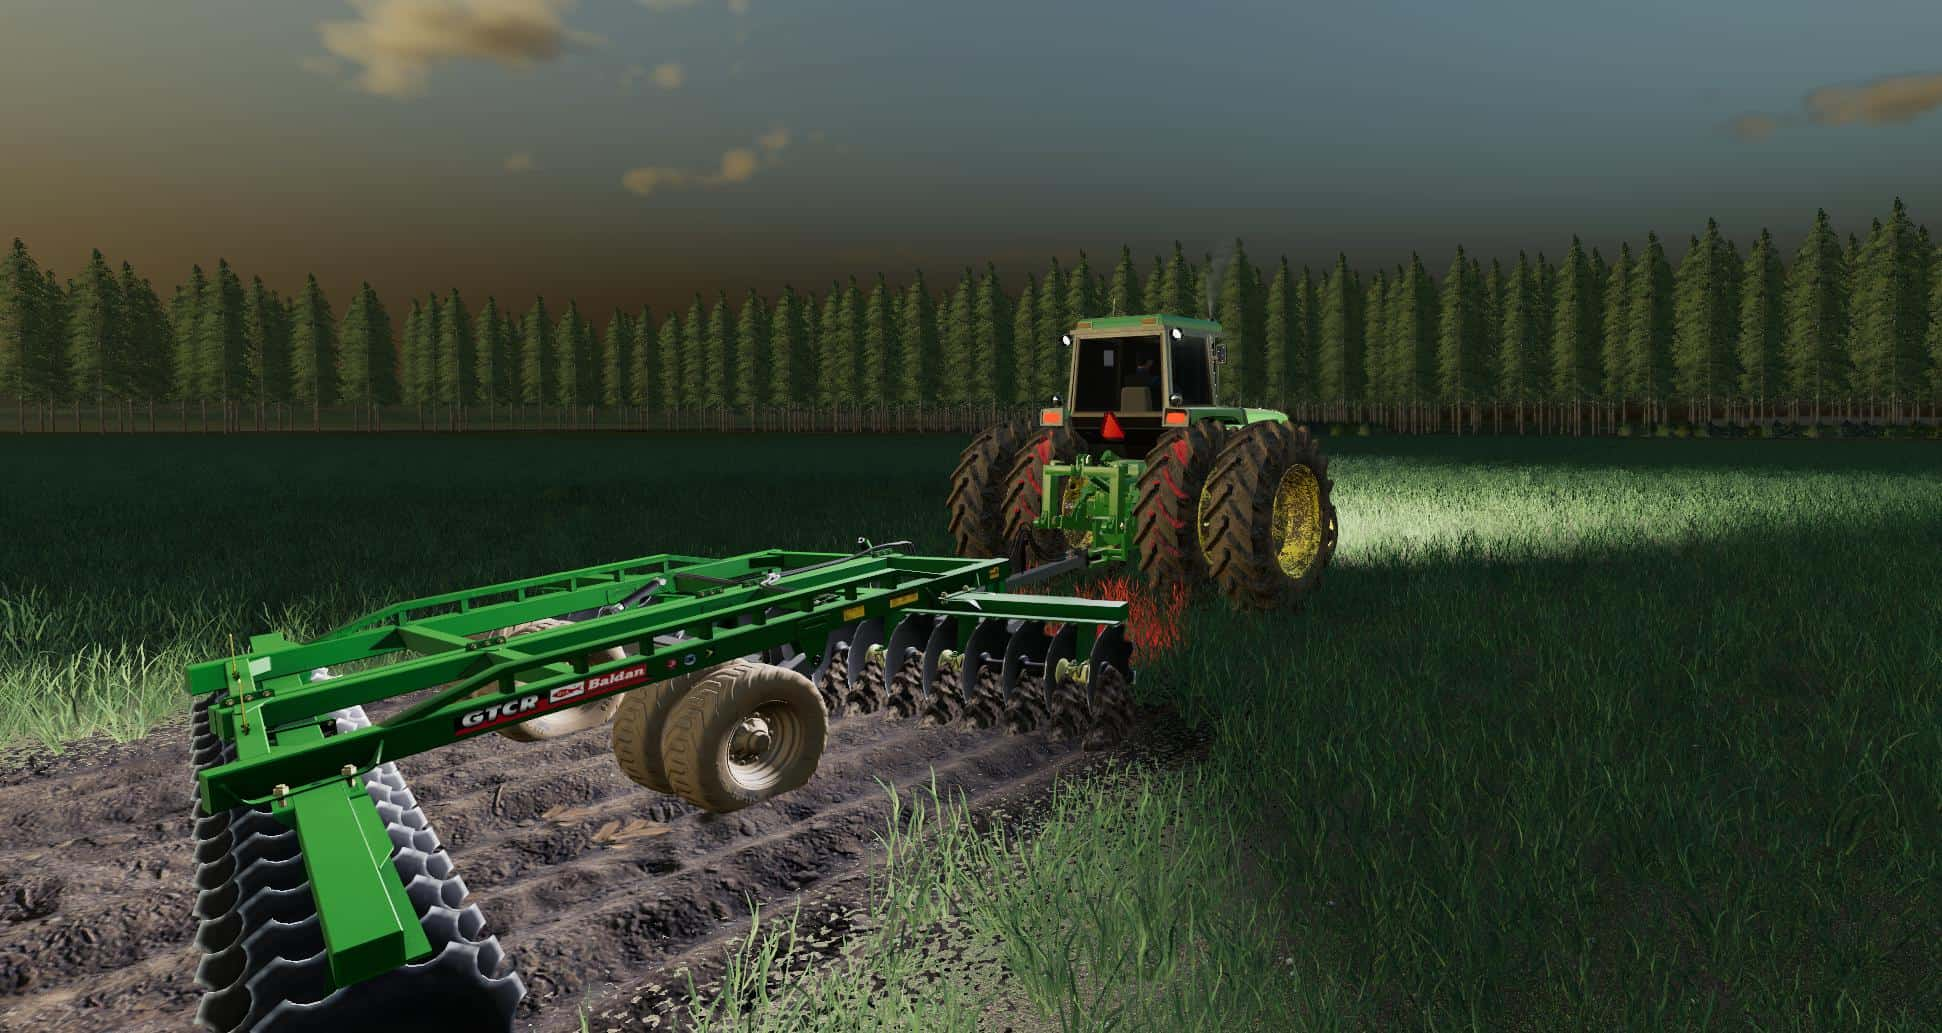 John Deere 4640 v1 0 0 1 Mod - Farming Simulator 19 Mod / FS19